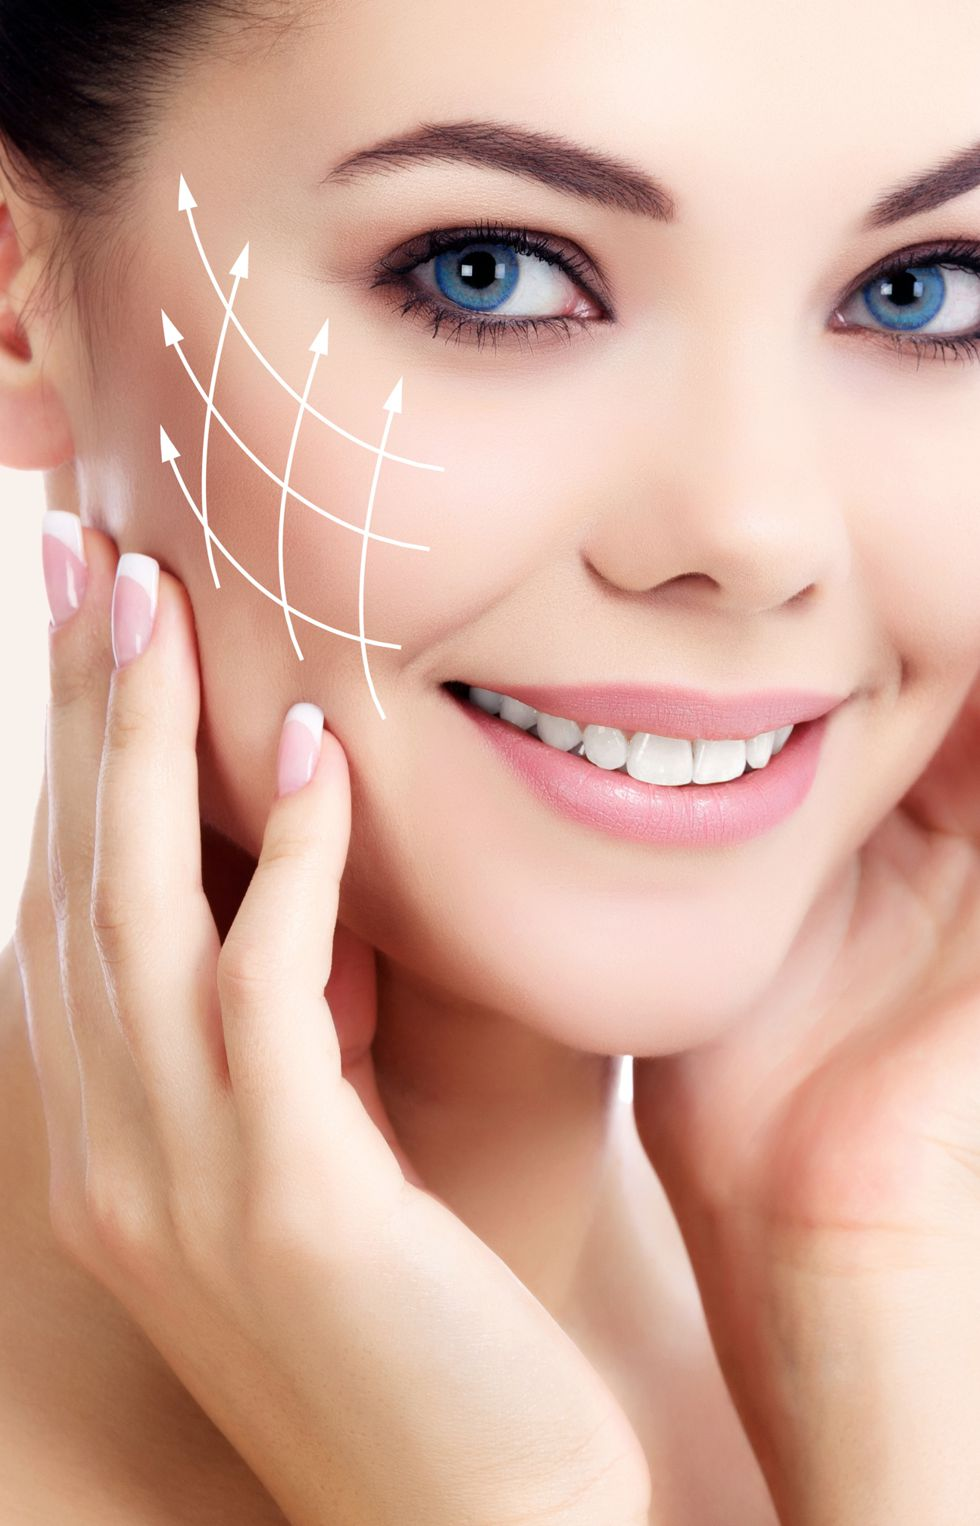 Cristal Beauty medicina estetica torino